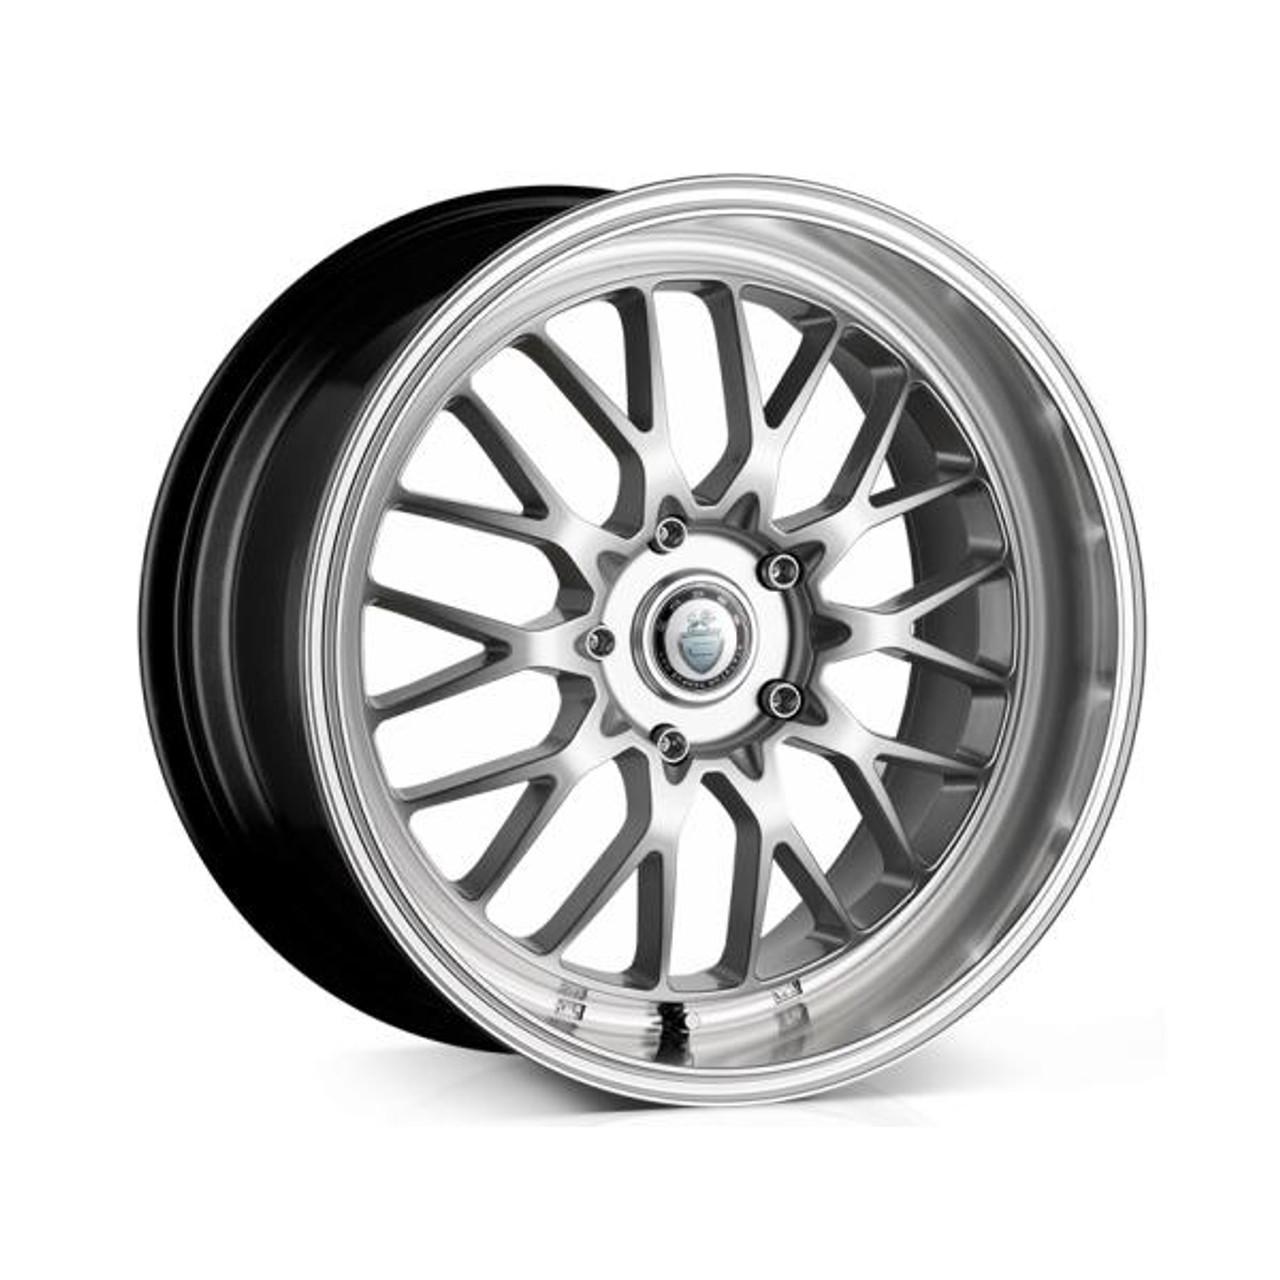 Cades Tyrus Alloy Wheels Silver Lip Polish